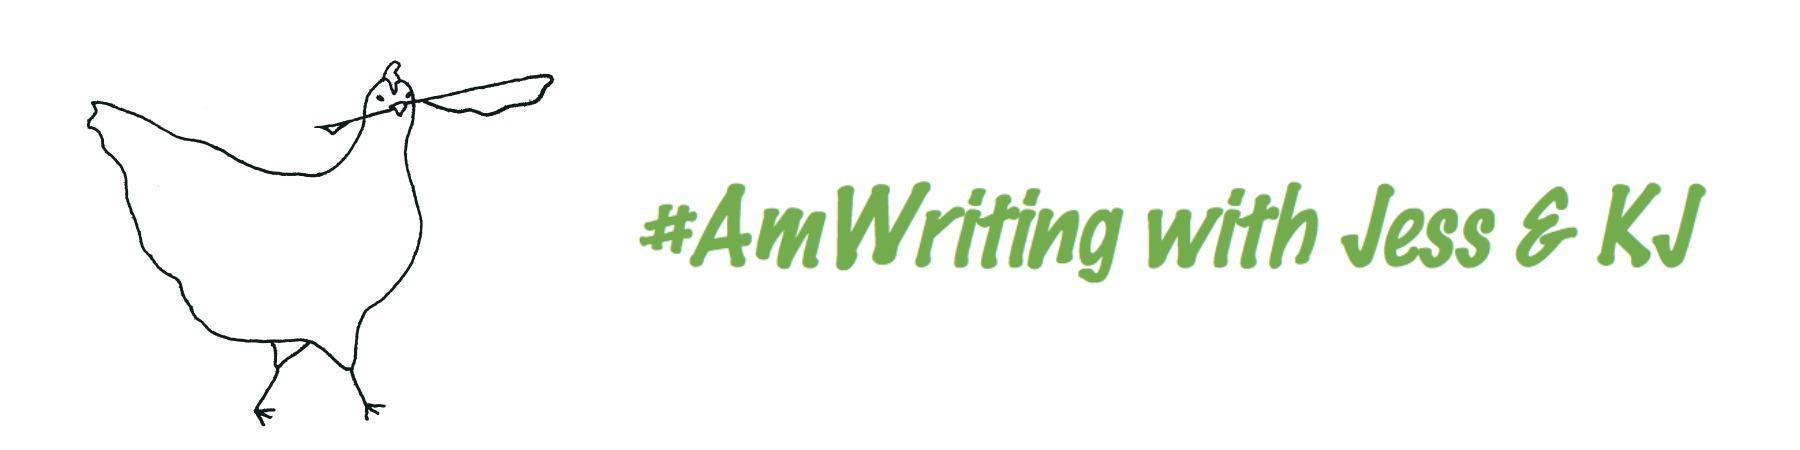 amwriting_1800x450